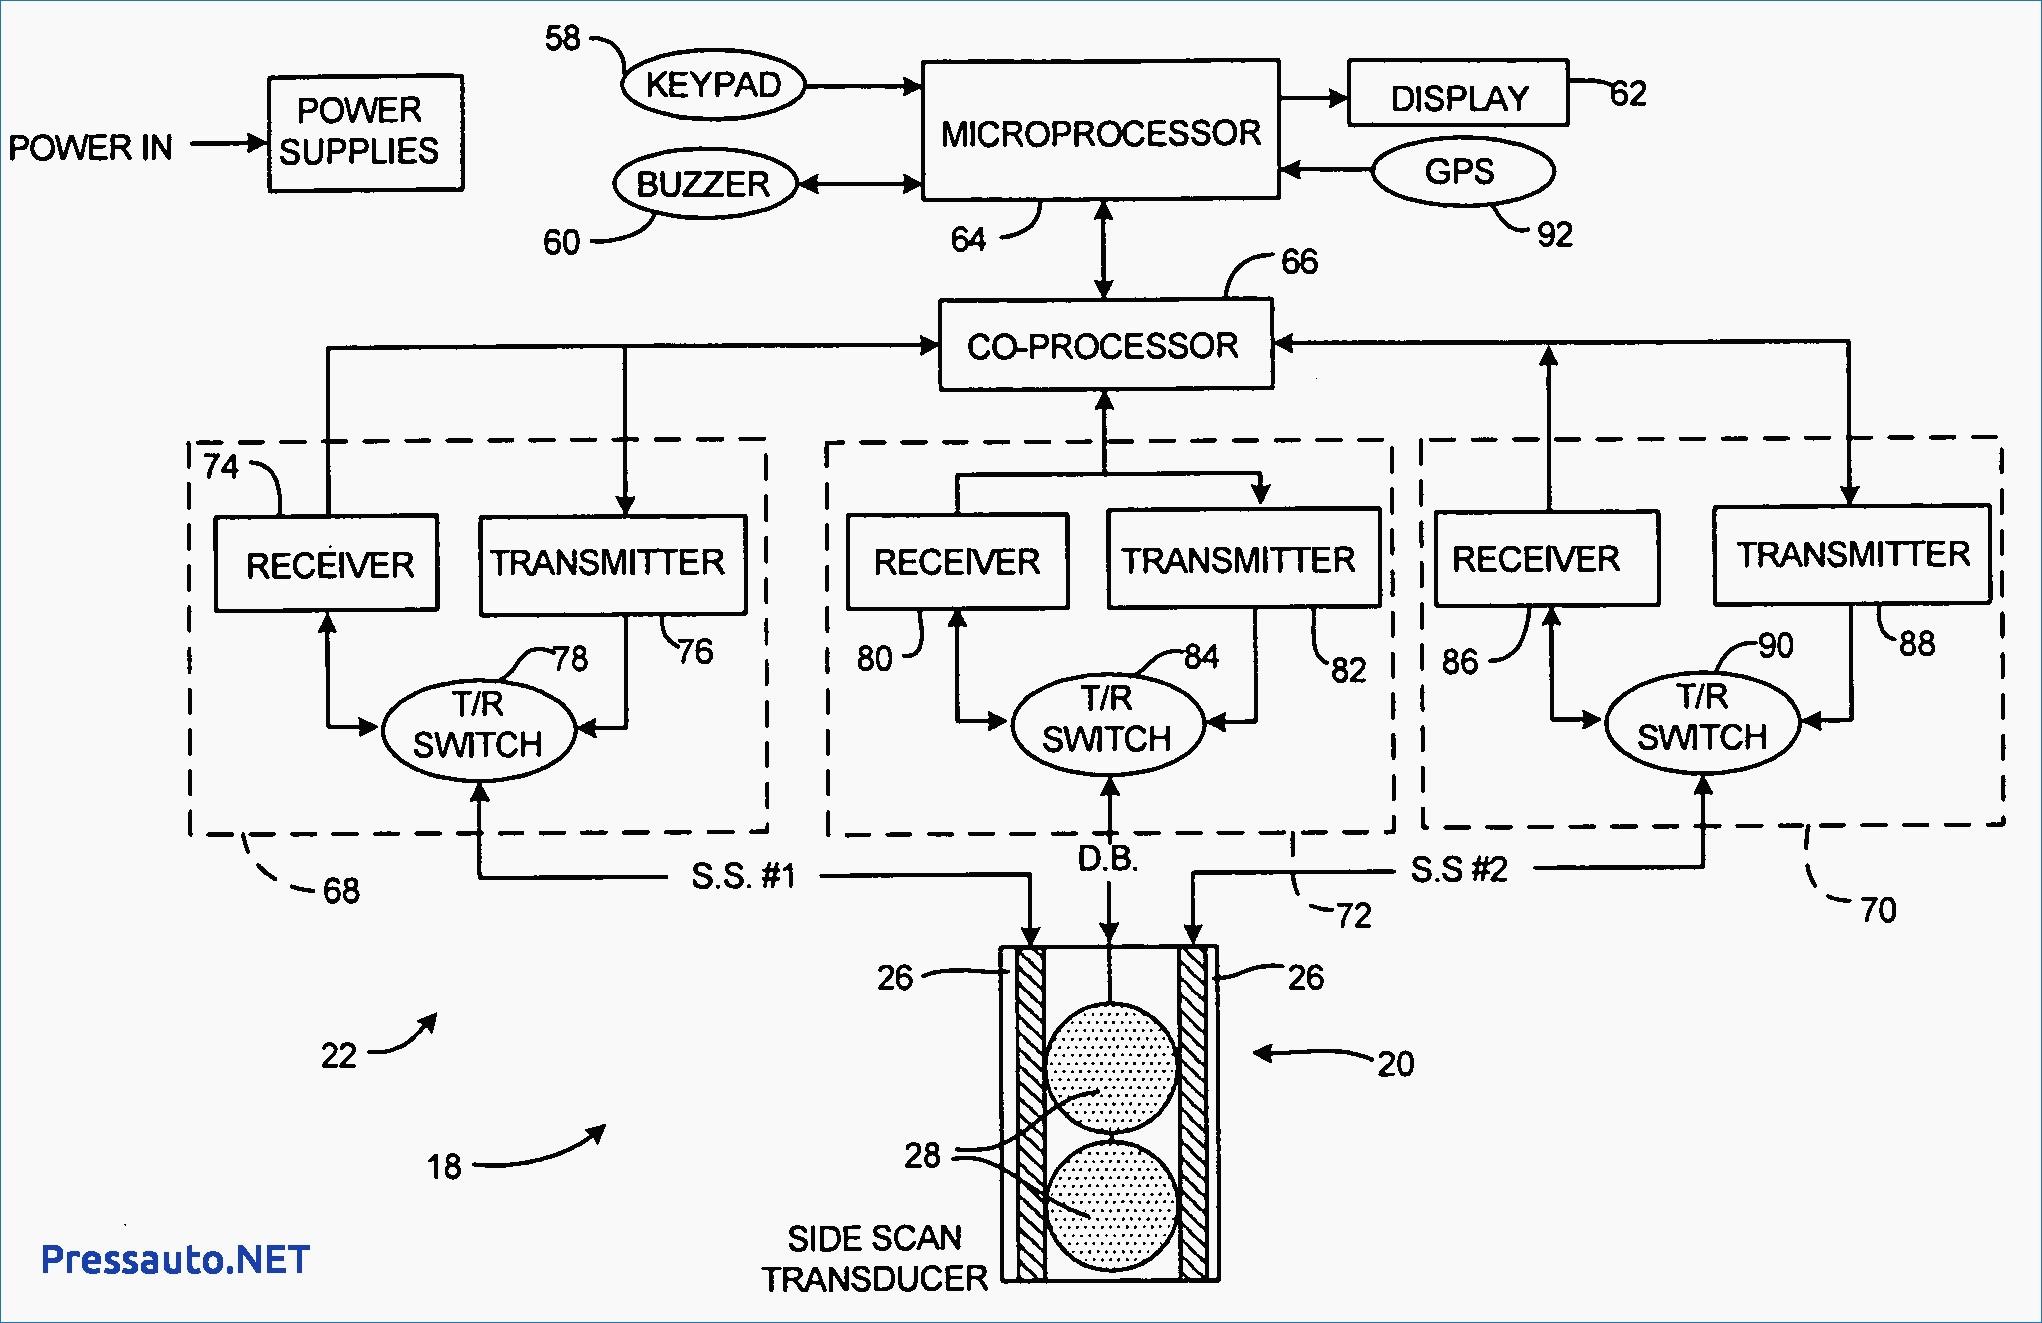 hds 8 wiring diagram sonar wiring diagrams wiring diagram data  sonar wiring diagrams wiring diagram data